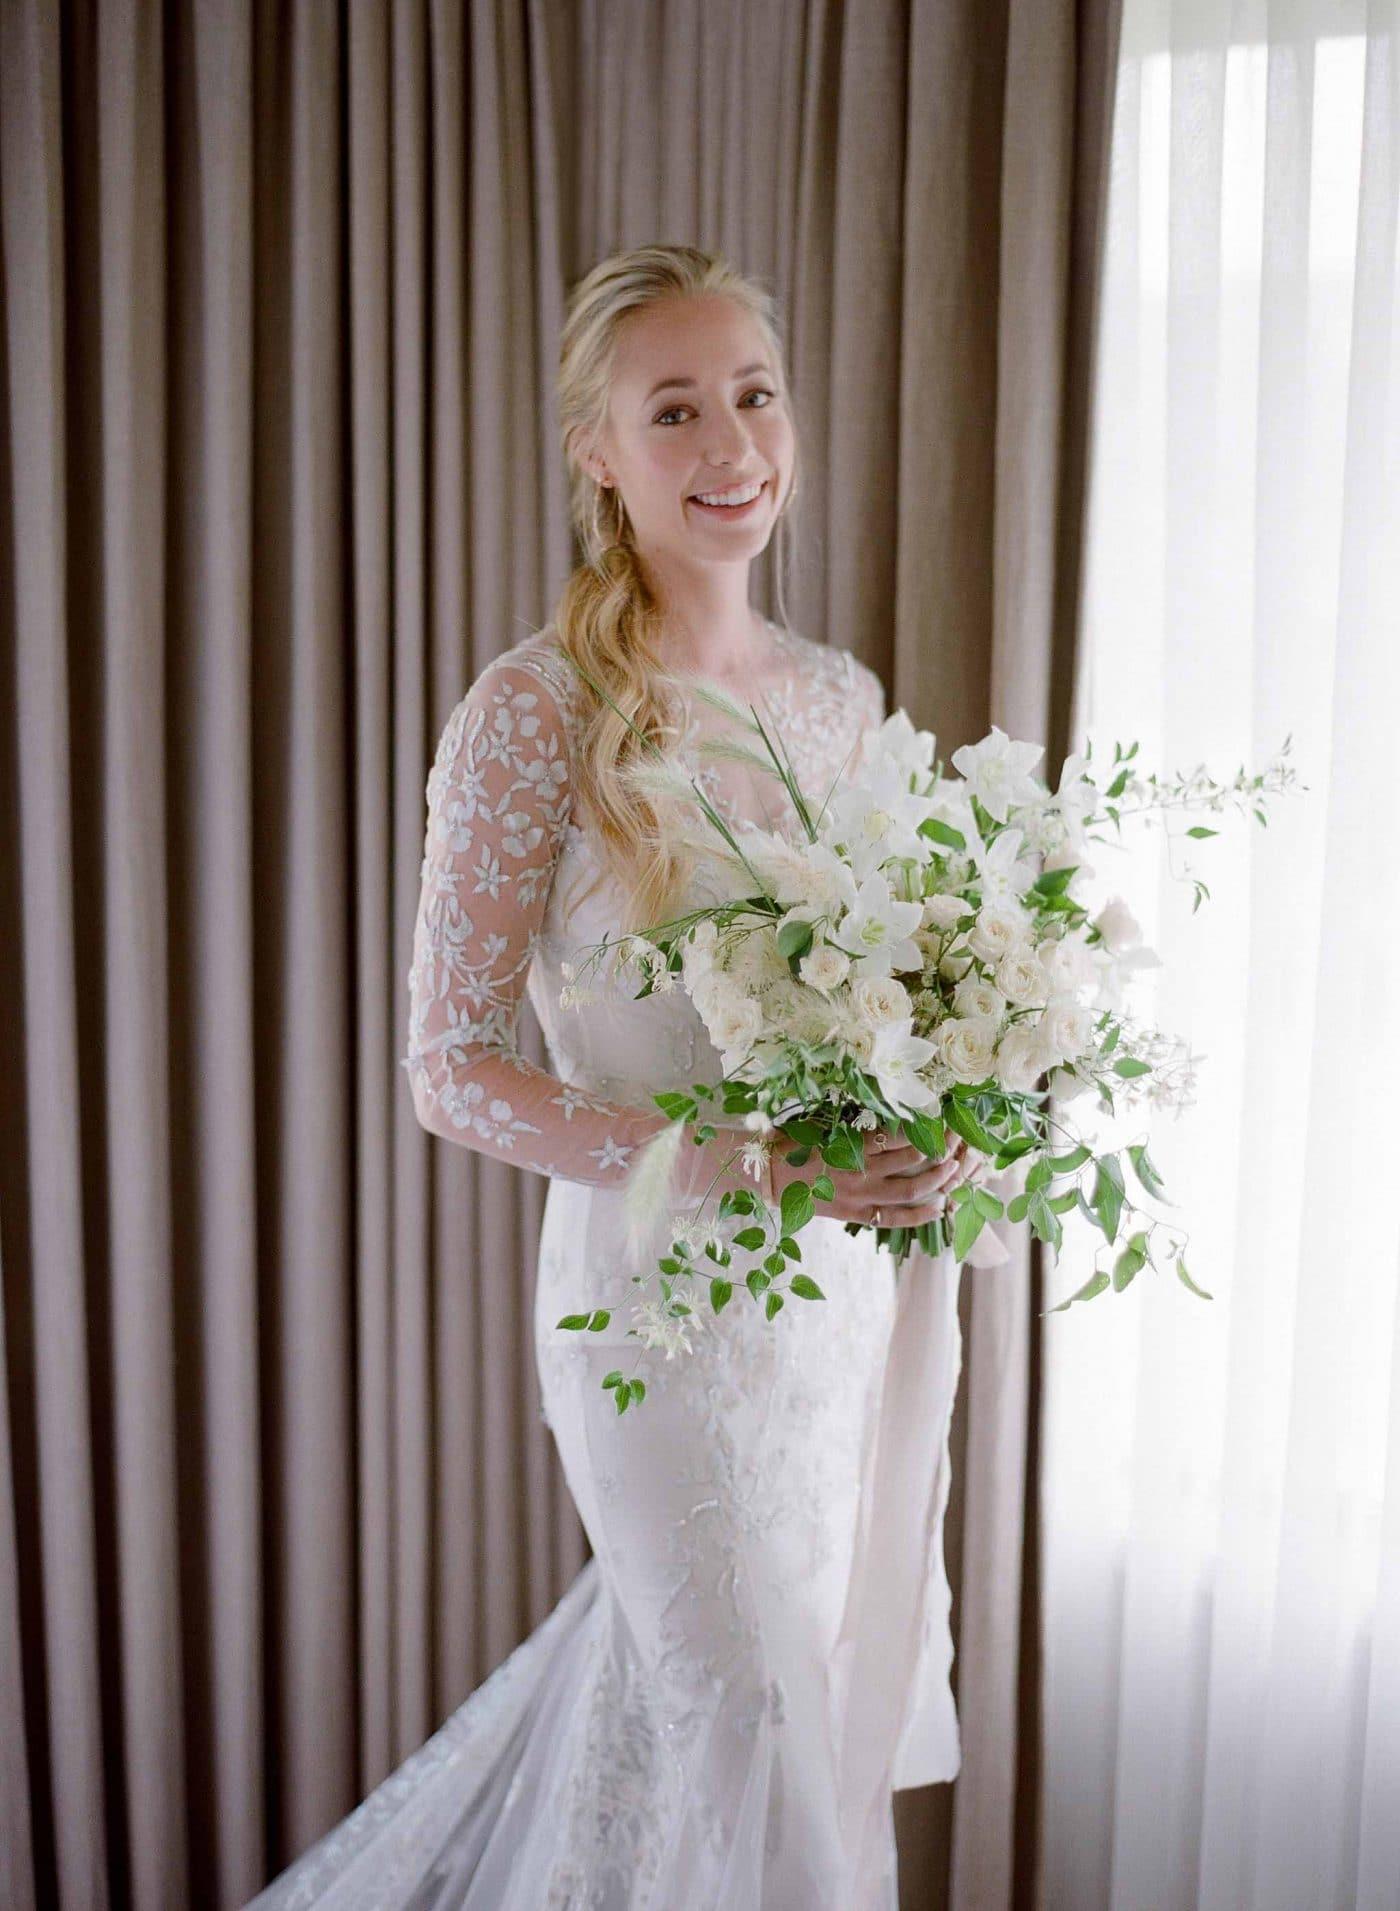 garland ceremony wedding ideas | sarahwinward.com